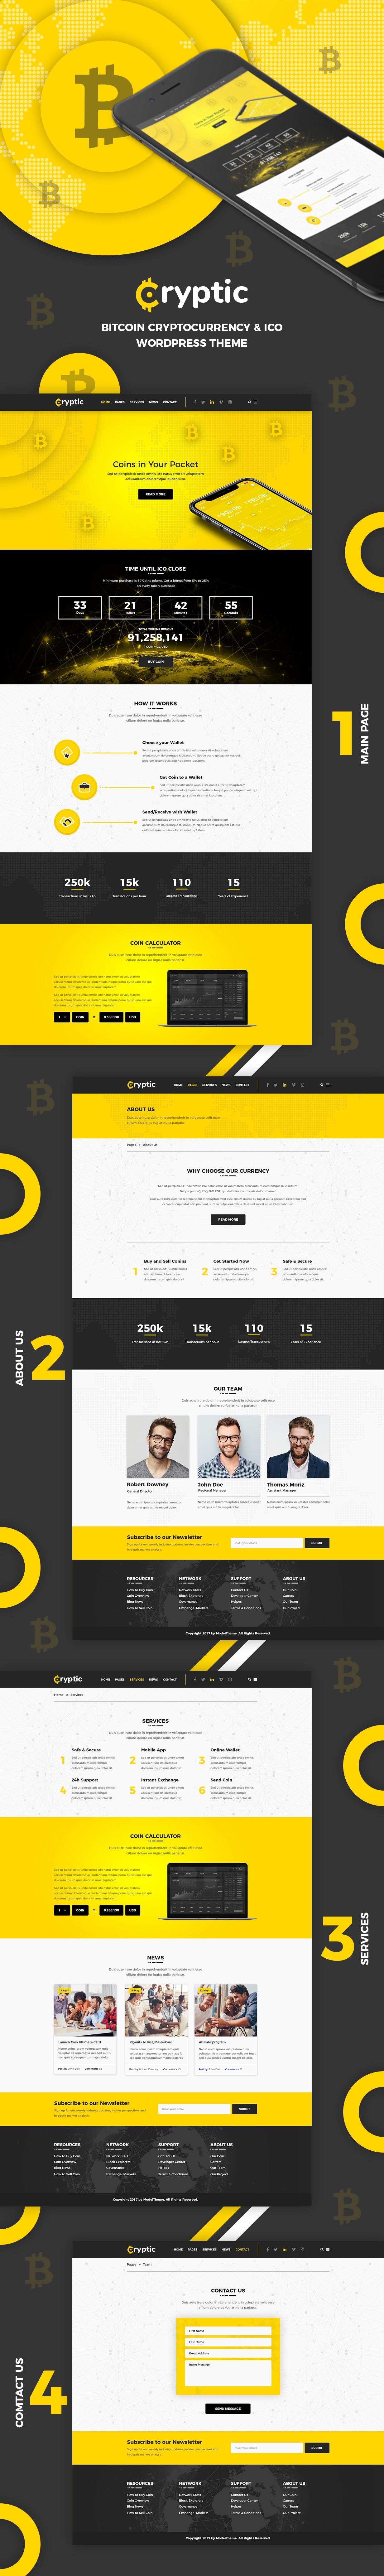 Cryptic - Cryptocurrency WordPress Theme - 6